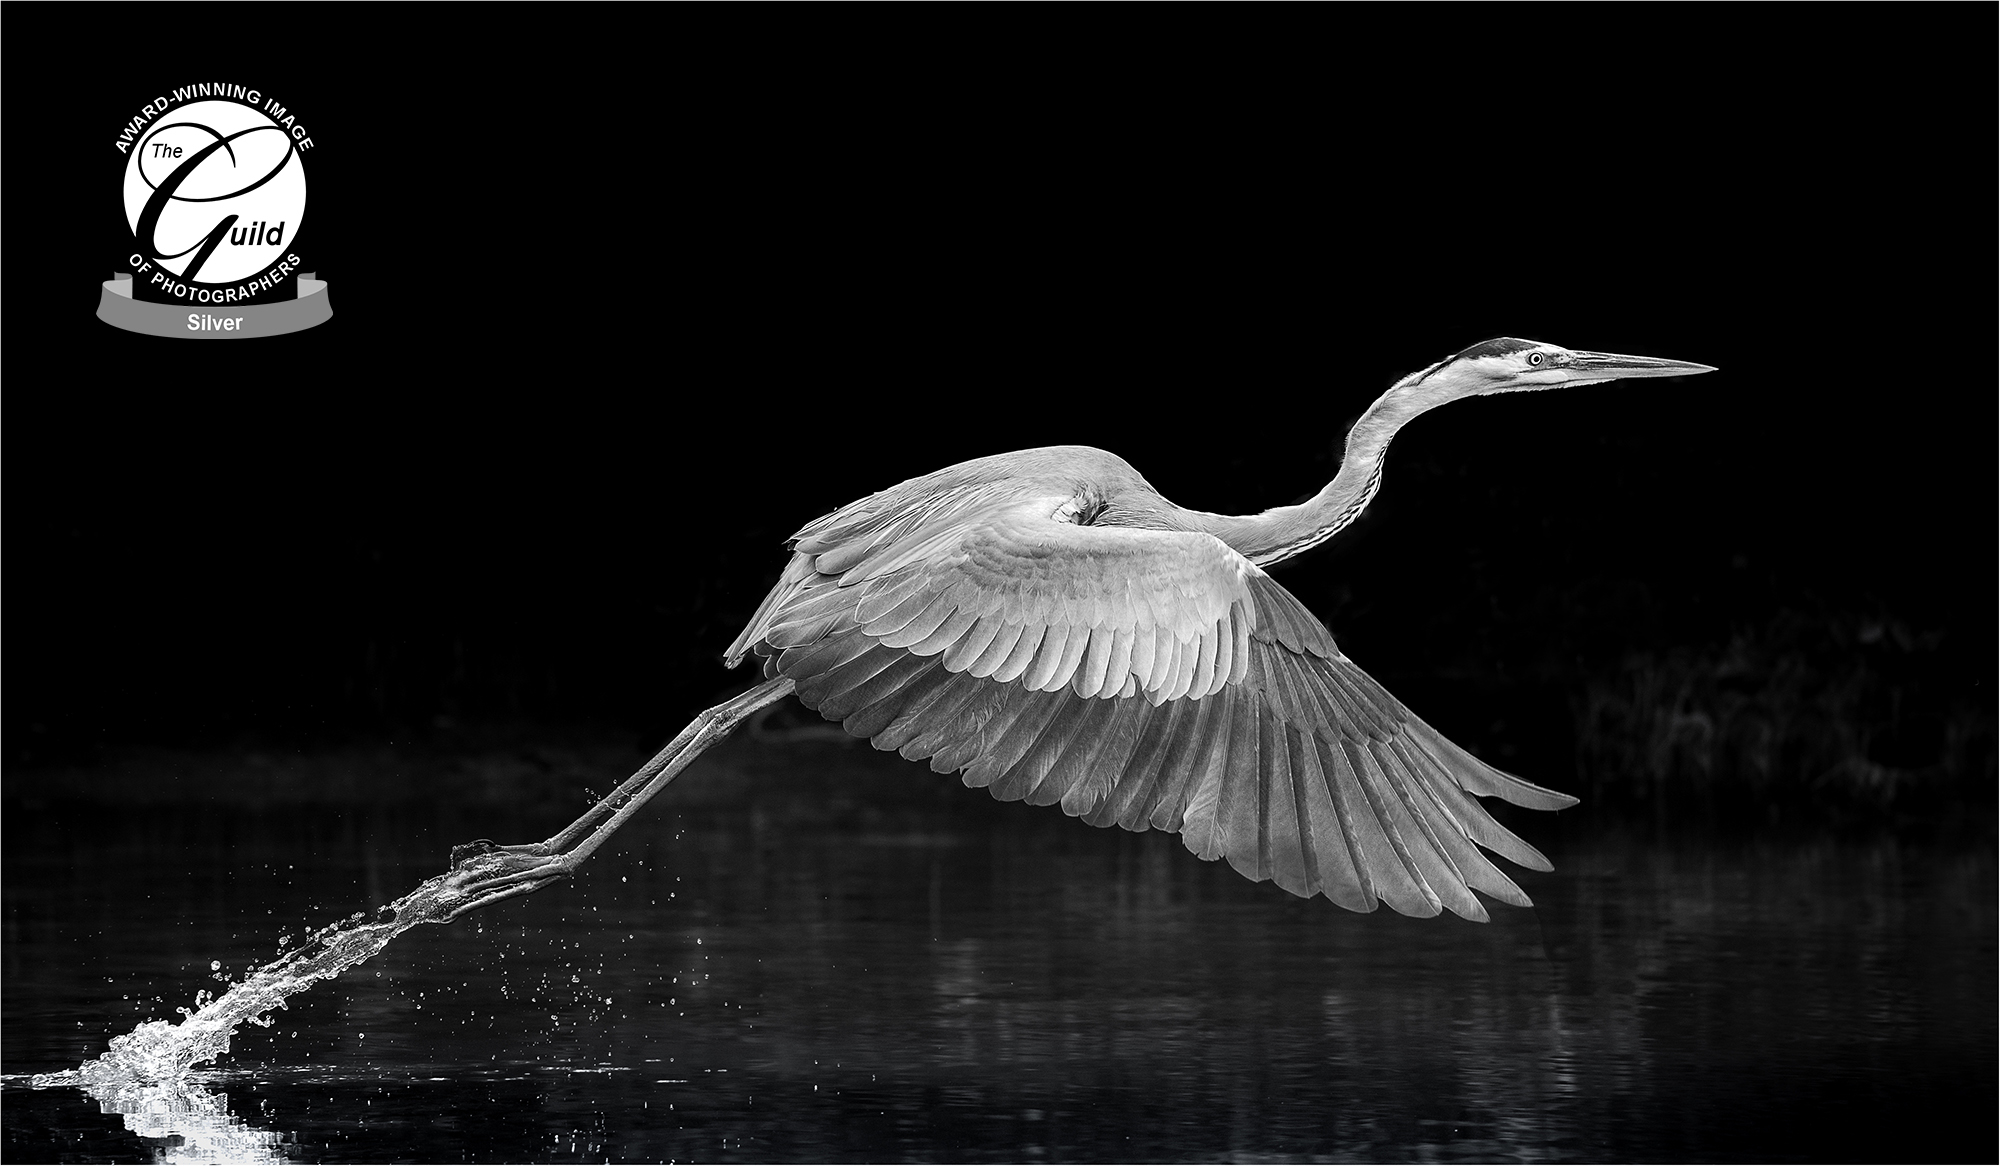 Silver Award - Guild of Photographer